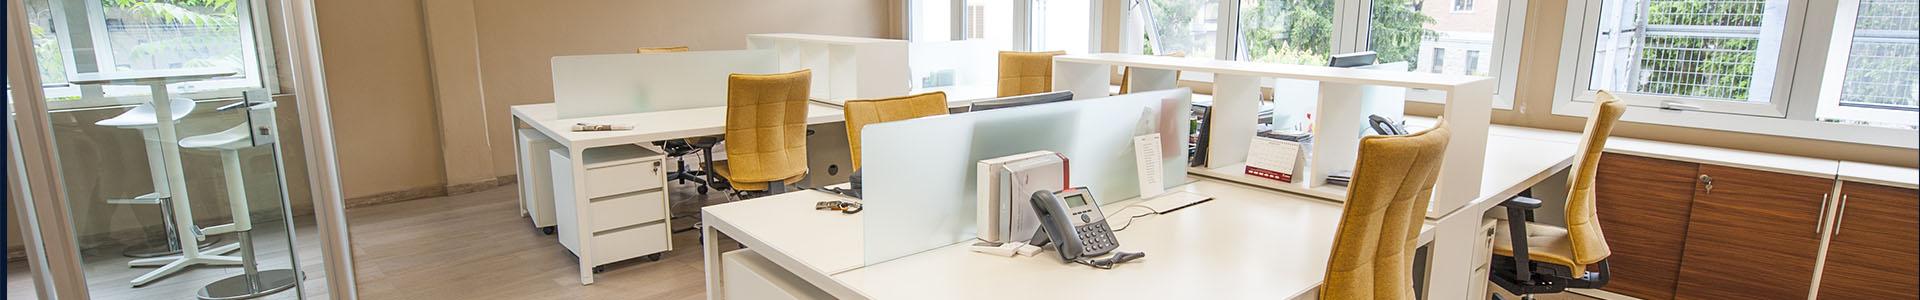 slide promos team work office